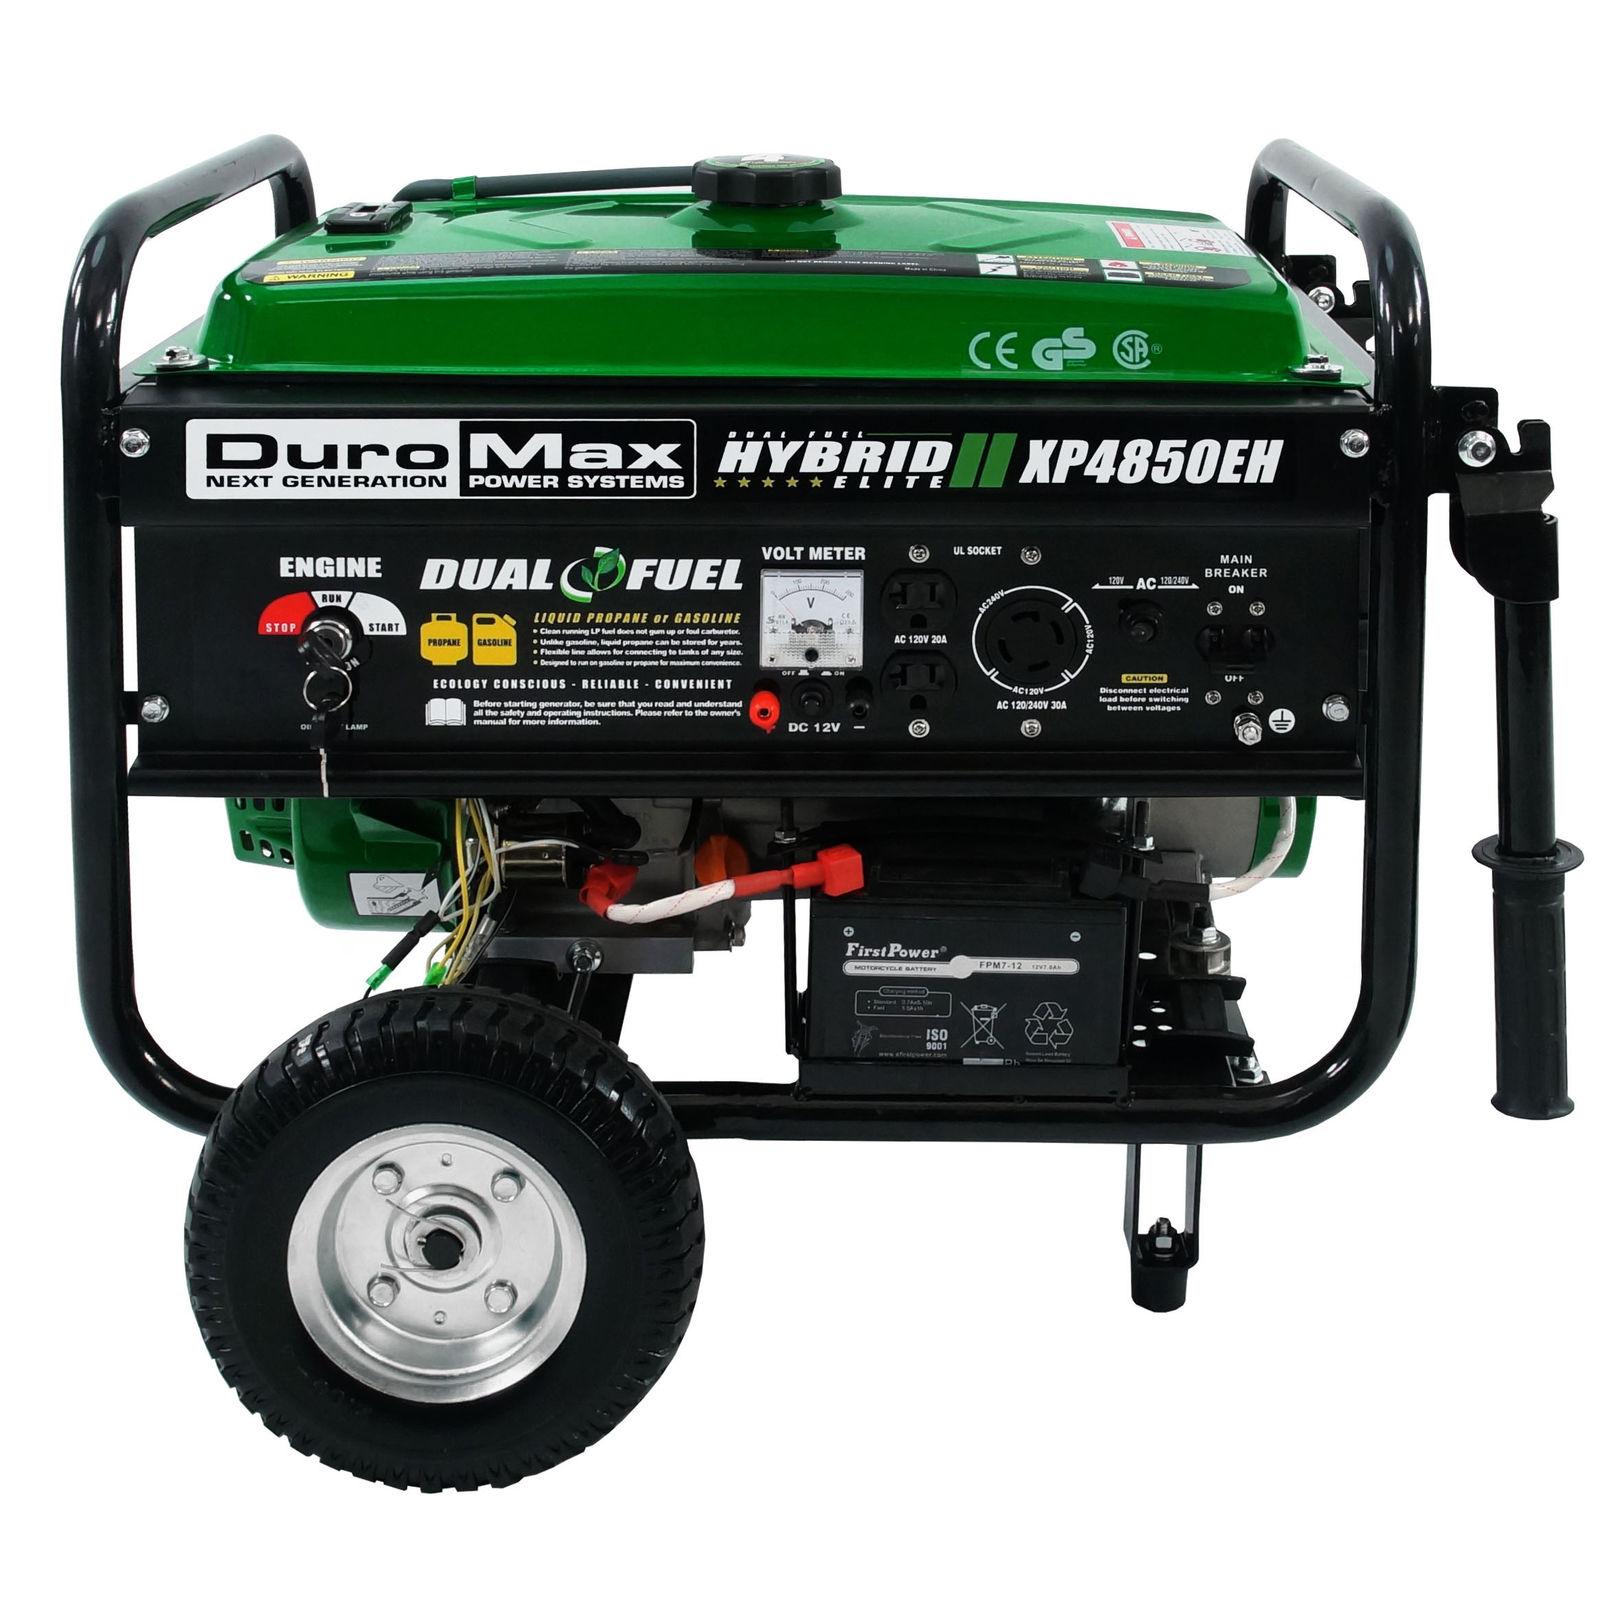 DuroMax XP4850EH Hybrid Portable Dual Fuel Propane / Gas Camping RV Generator - $324.99 + Free Shipping @ ebay.com